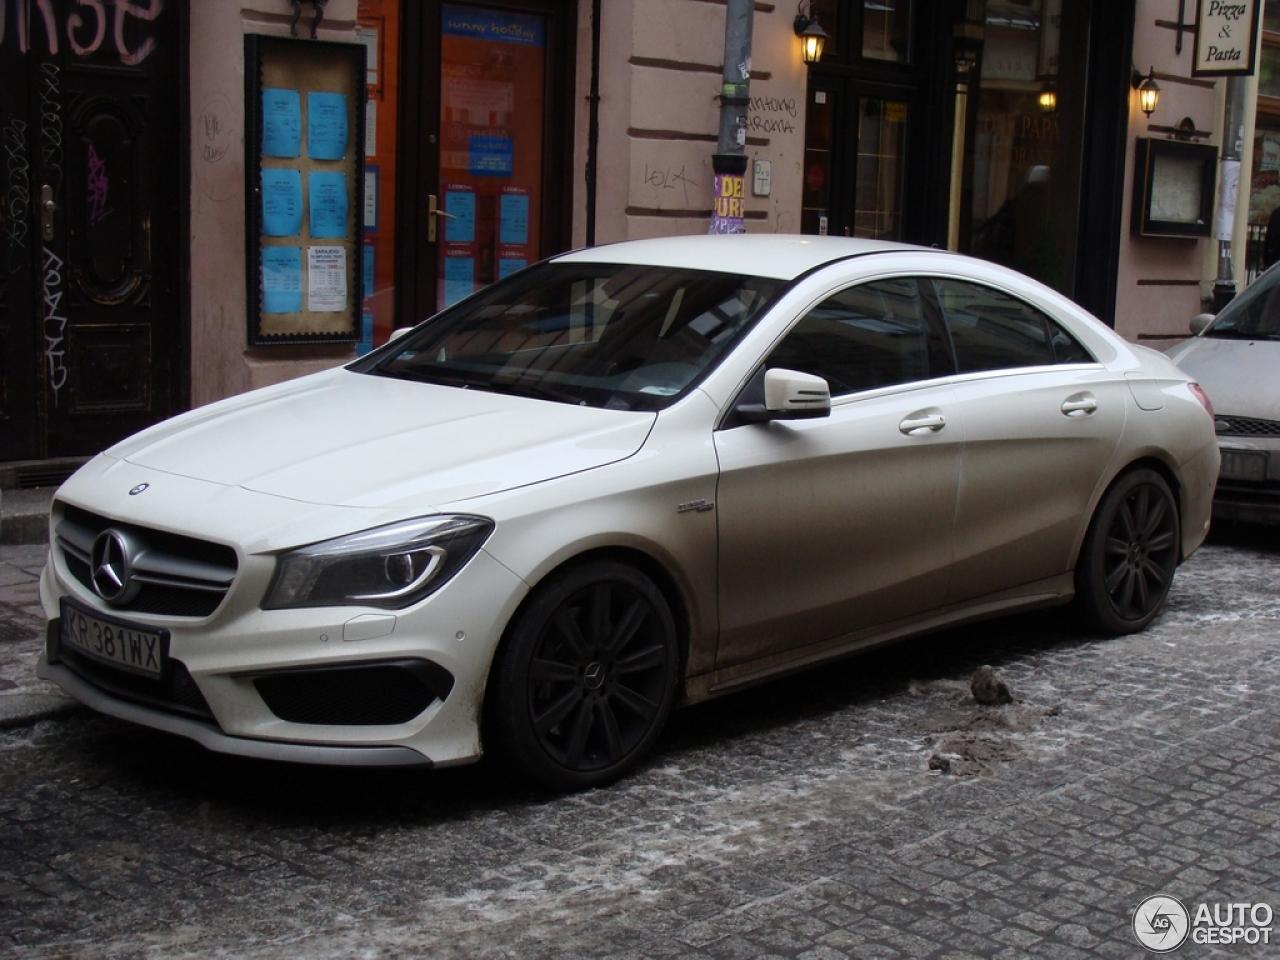 Mercedes benz cla 45 amg c117 12 march 2014 autogespot for Mercedes benz cla for sale uk